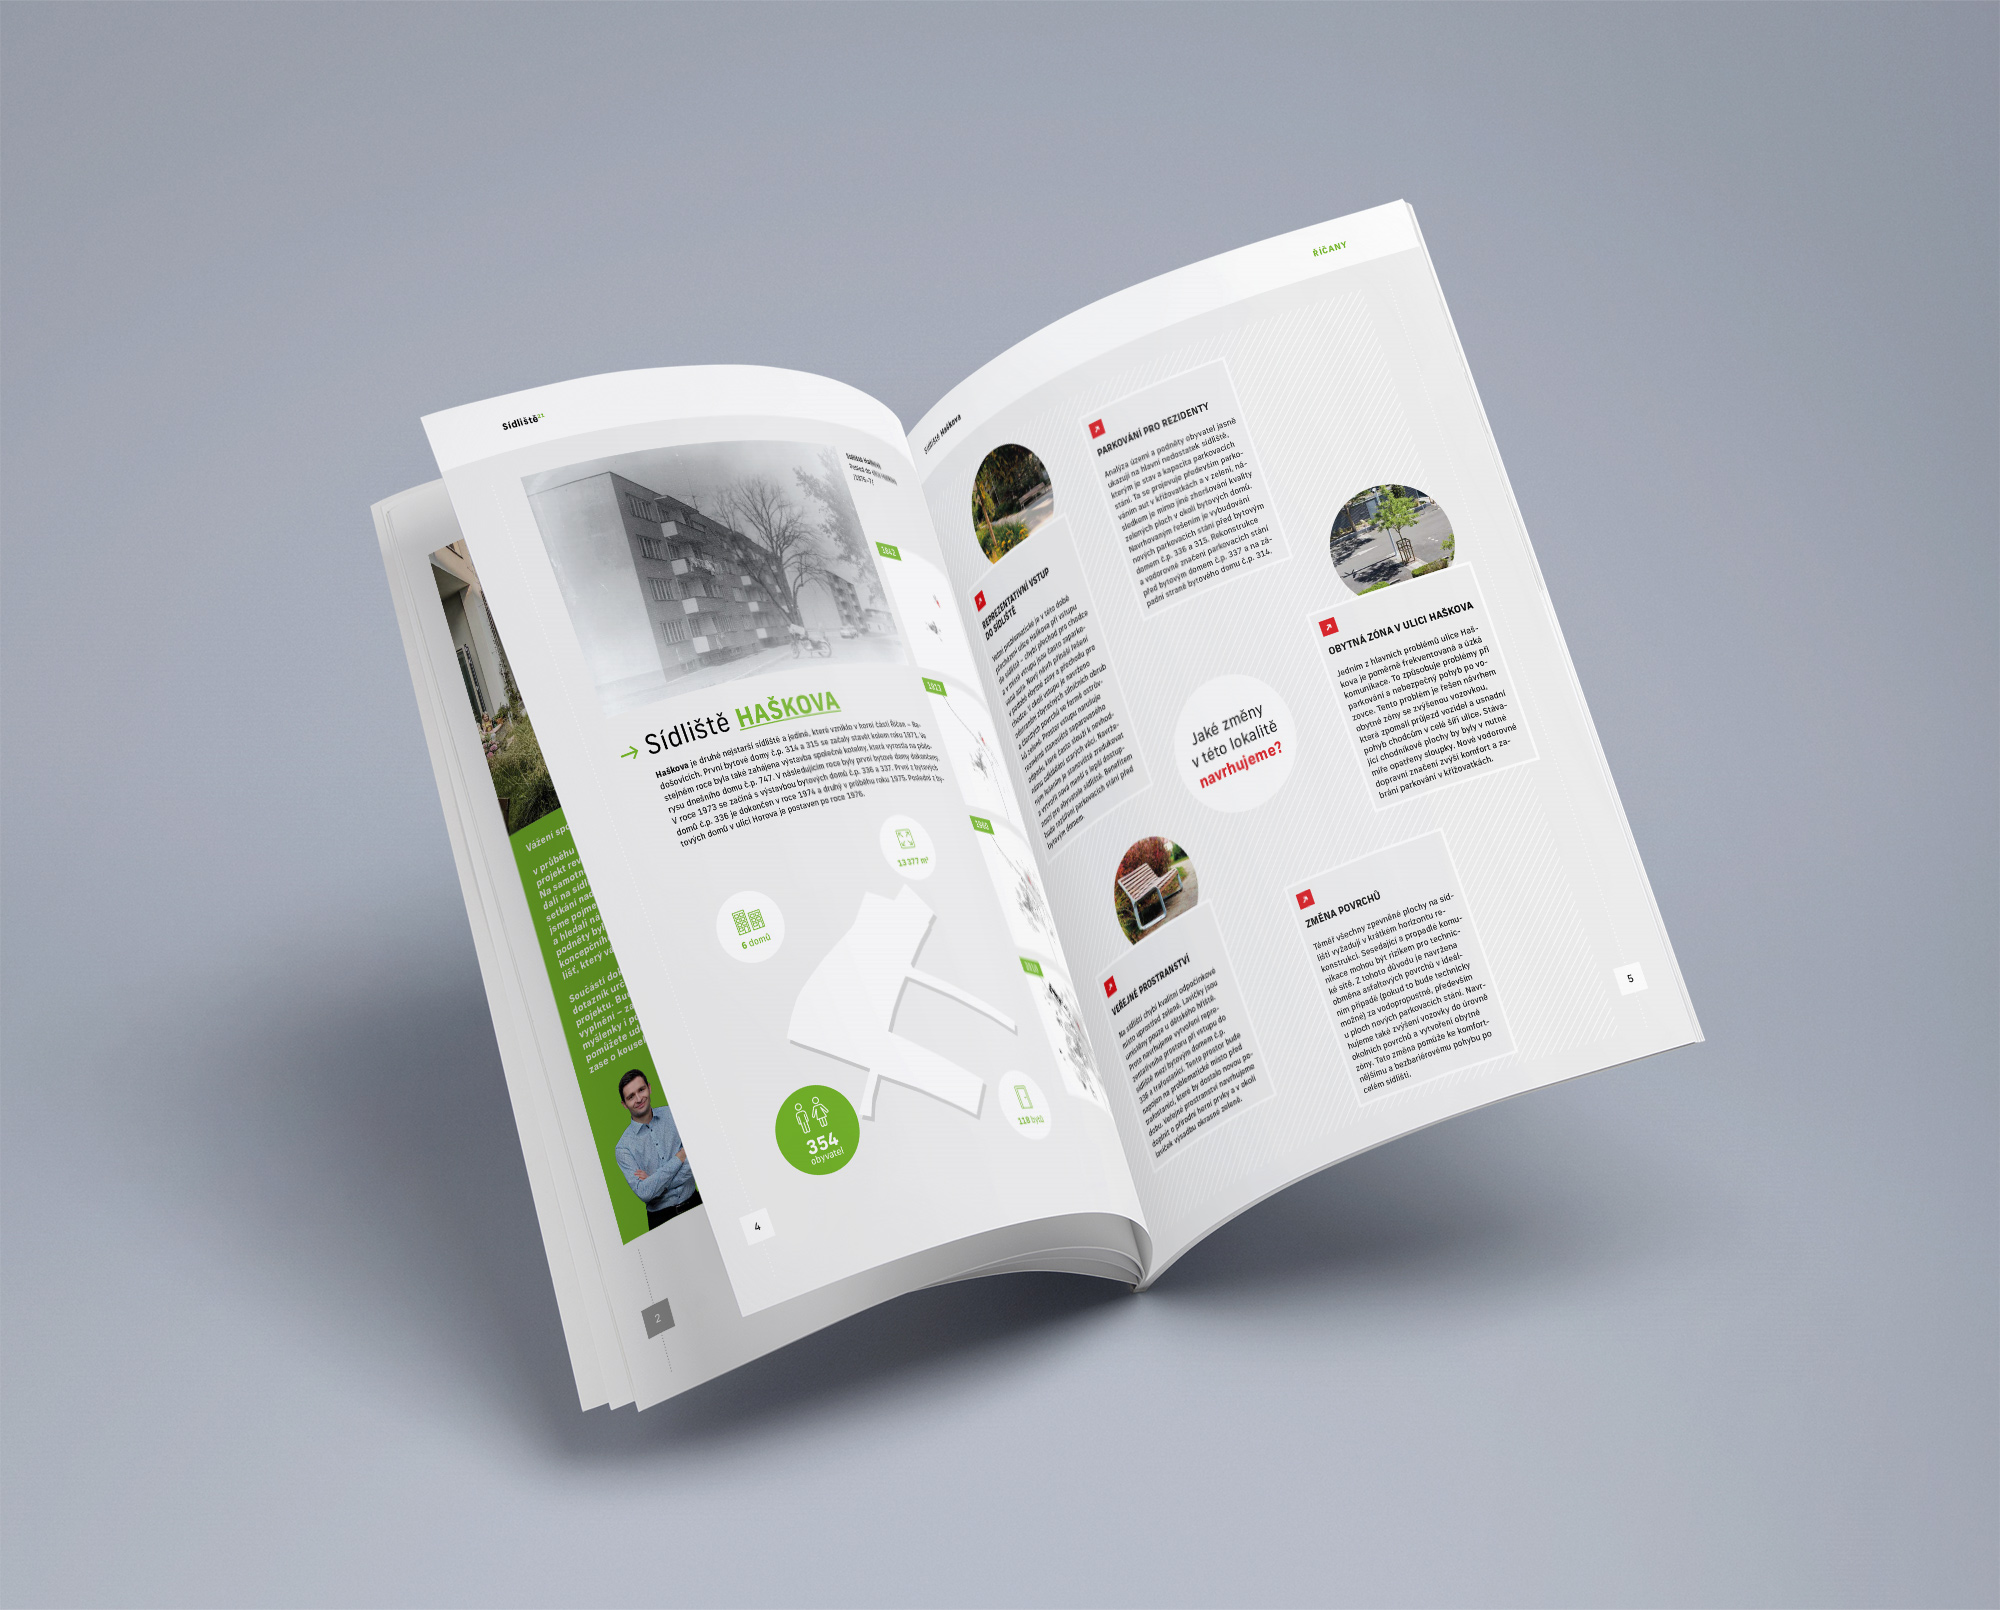 [album/Products_Model_Product/139/Sidliste_brozura_inside.jpg]